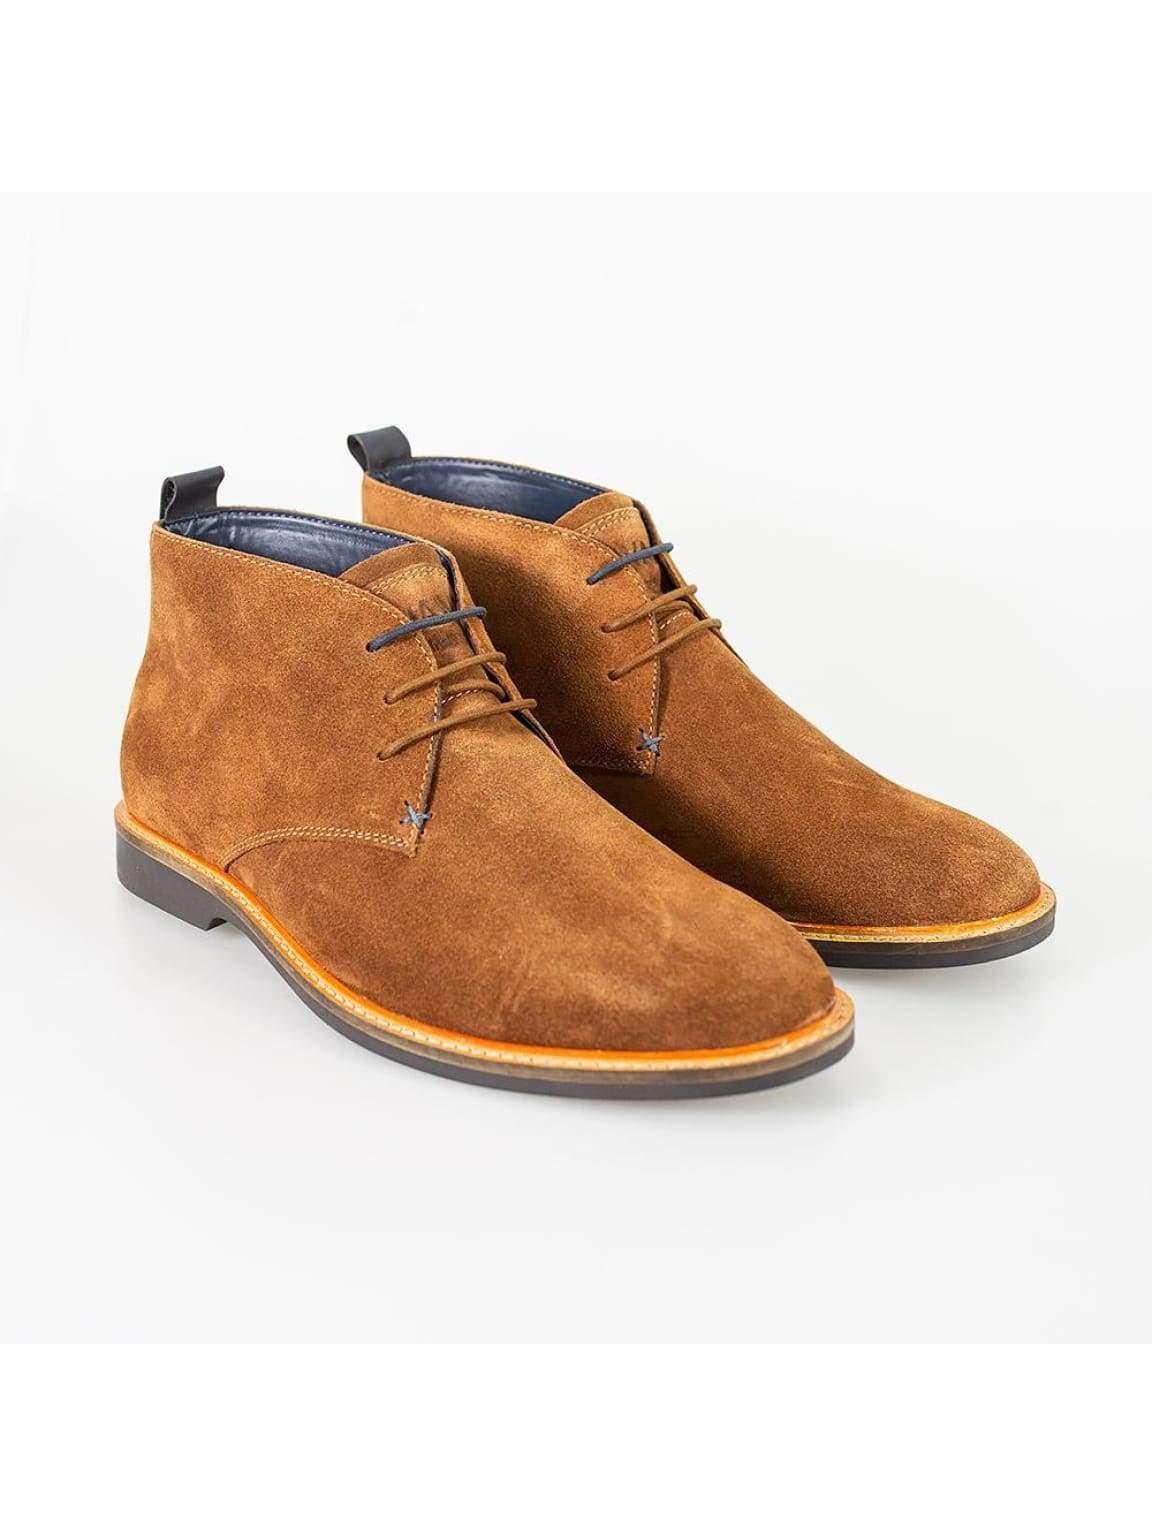 Cavani Sahara Tobacco Mens Leather Boots - UK7 | EU41 - Boots